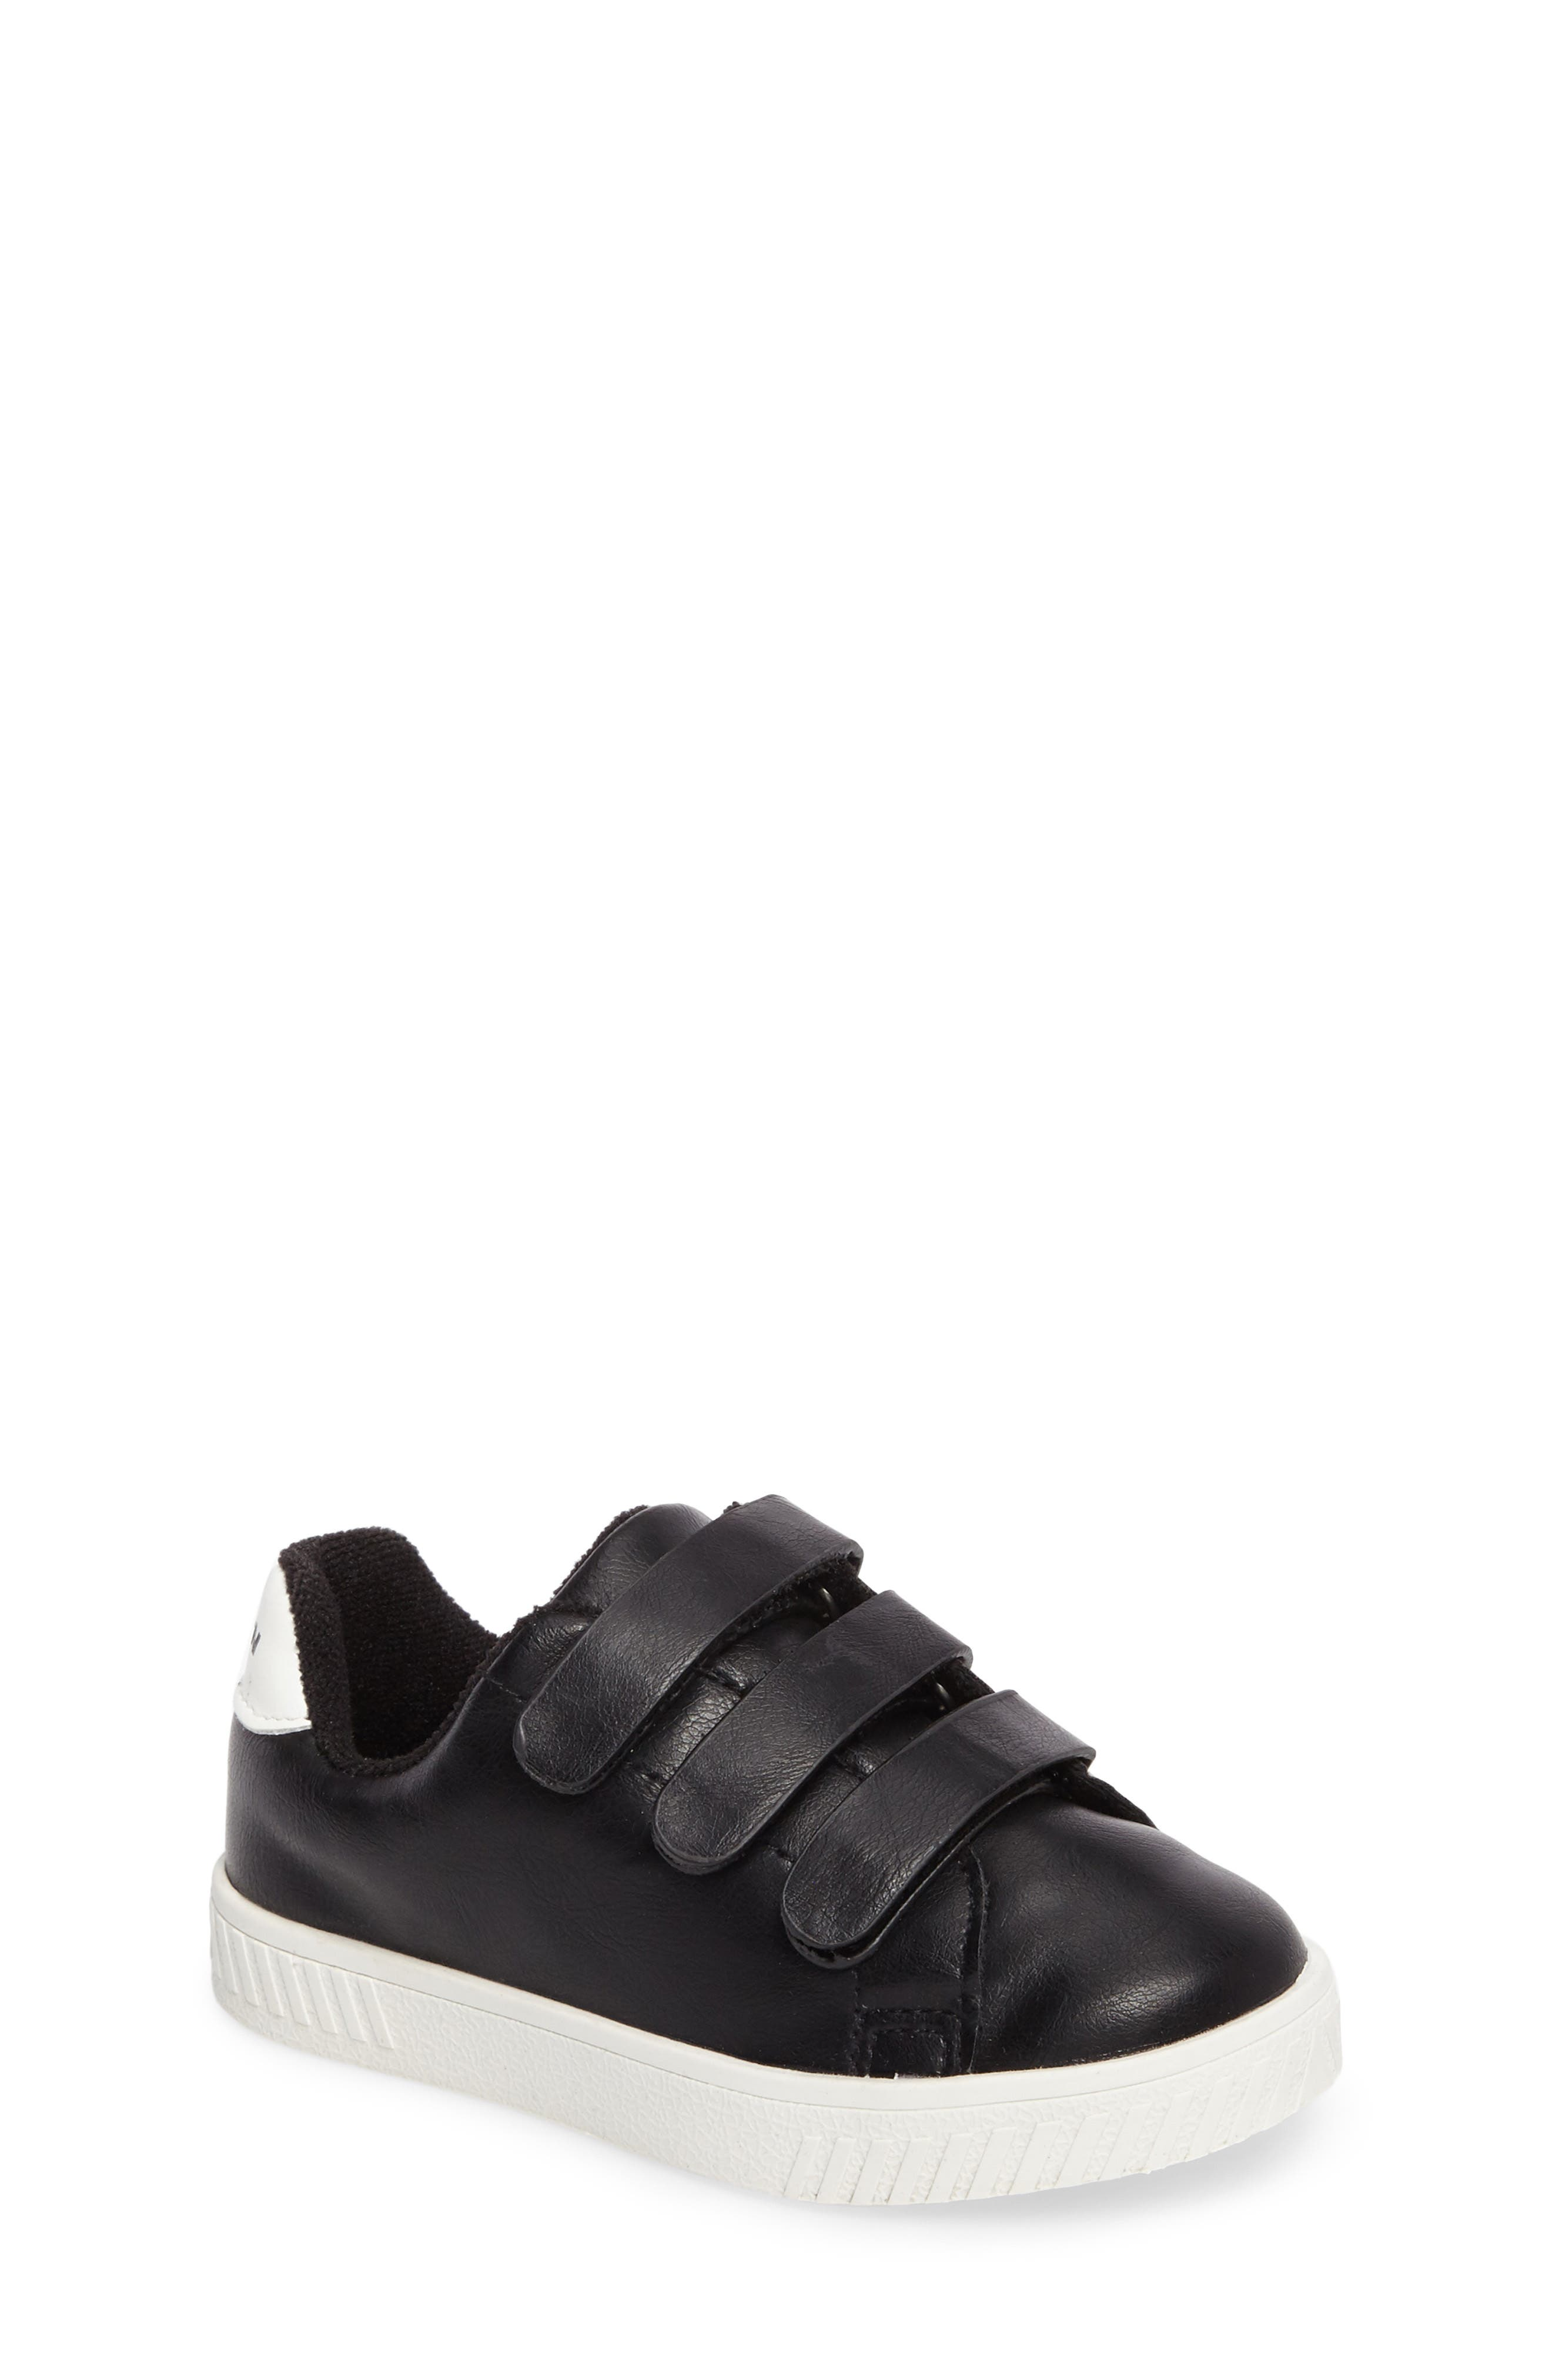 Tretorn Camden Carry Sneaker (Walker, Toddler, Little Kid & Big Kid)